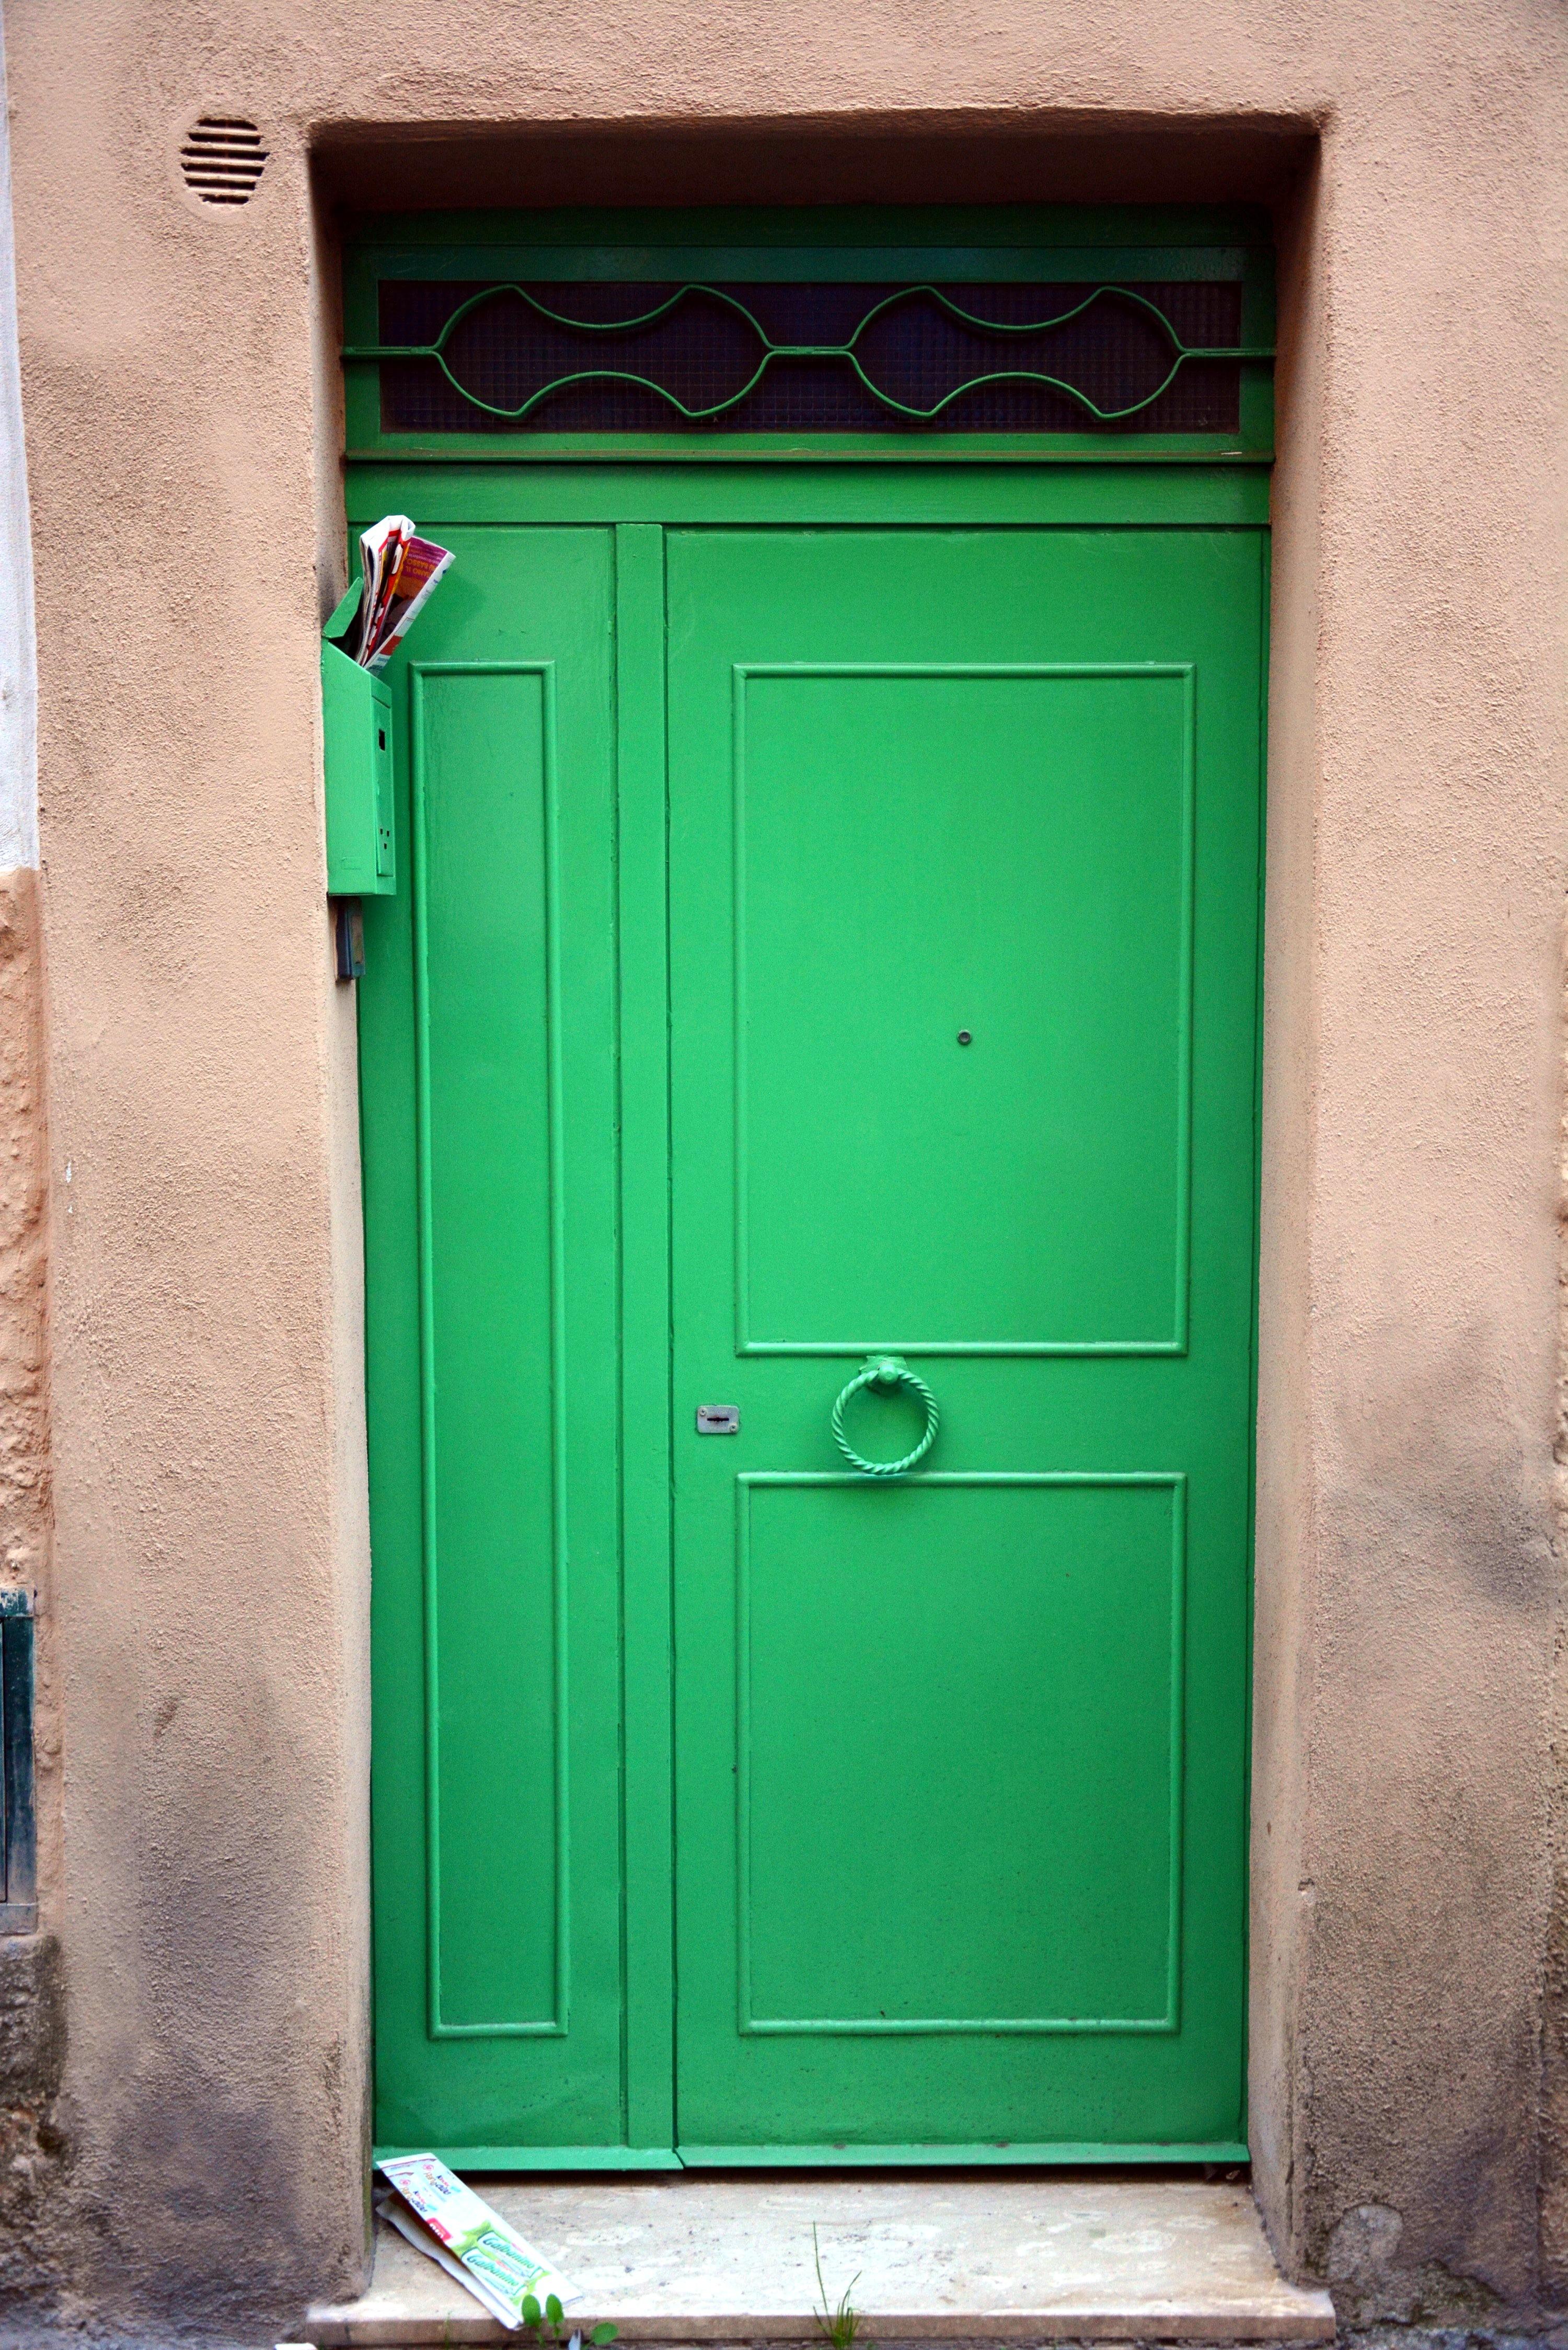 Montecompatri, door